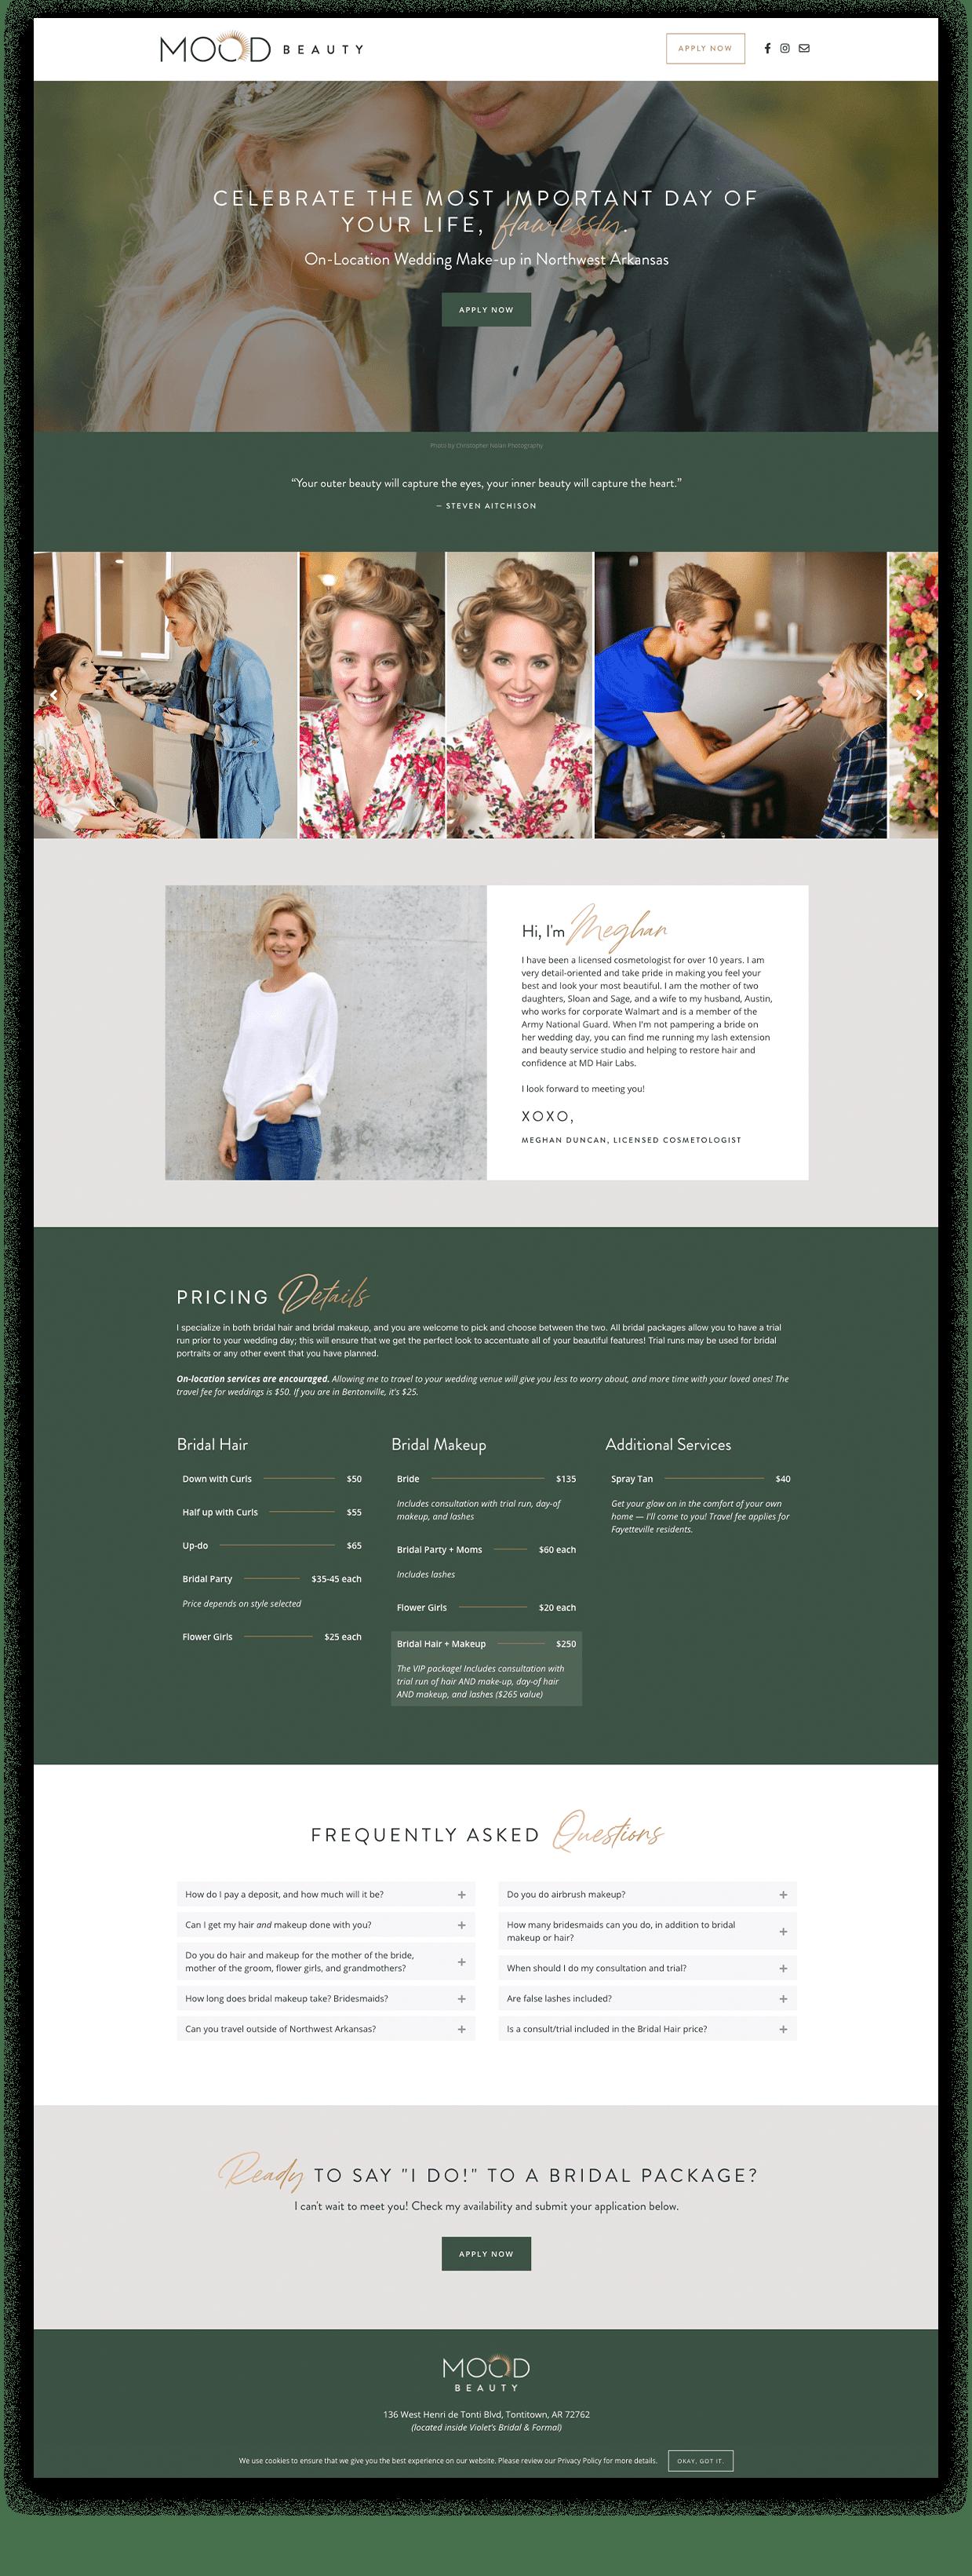 MOOD Beauty WordPress Website Design